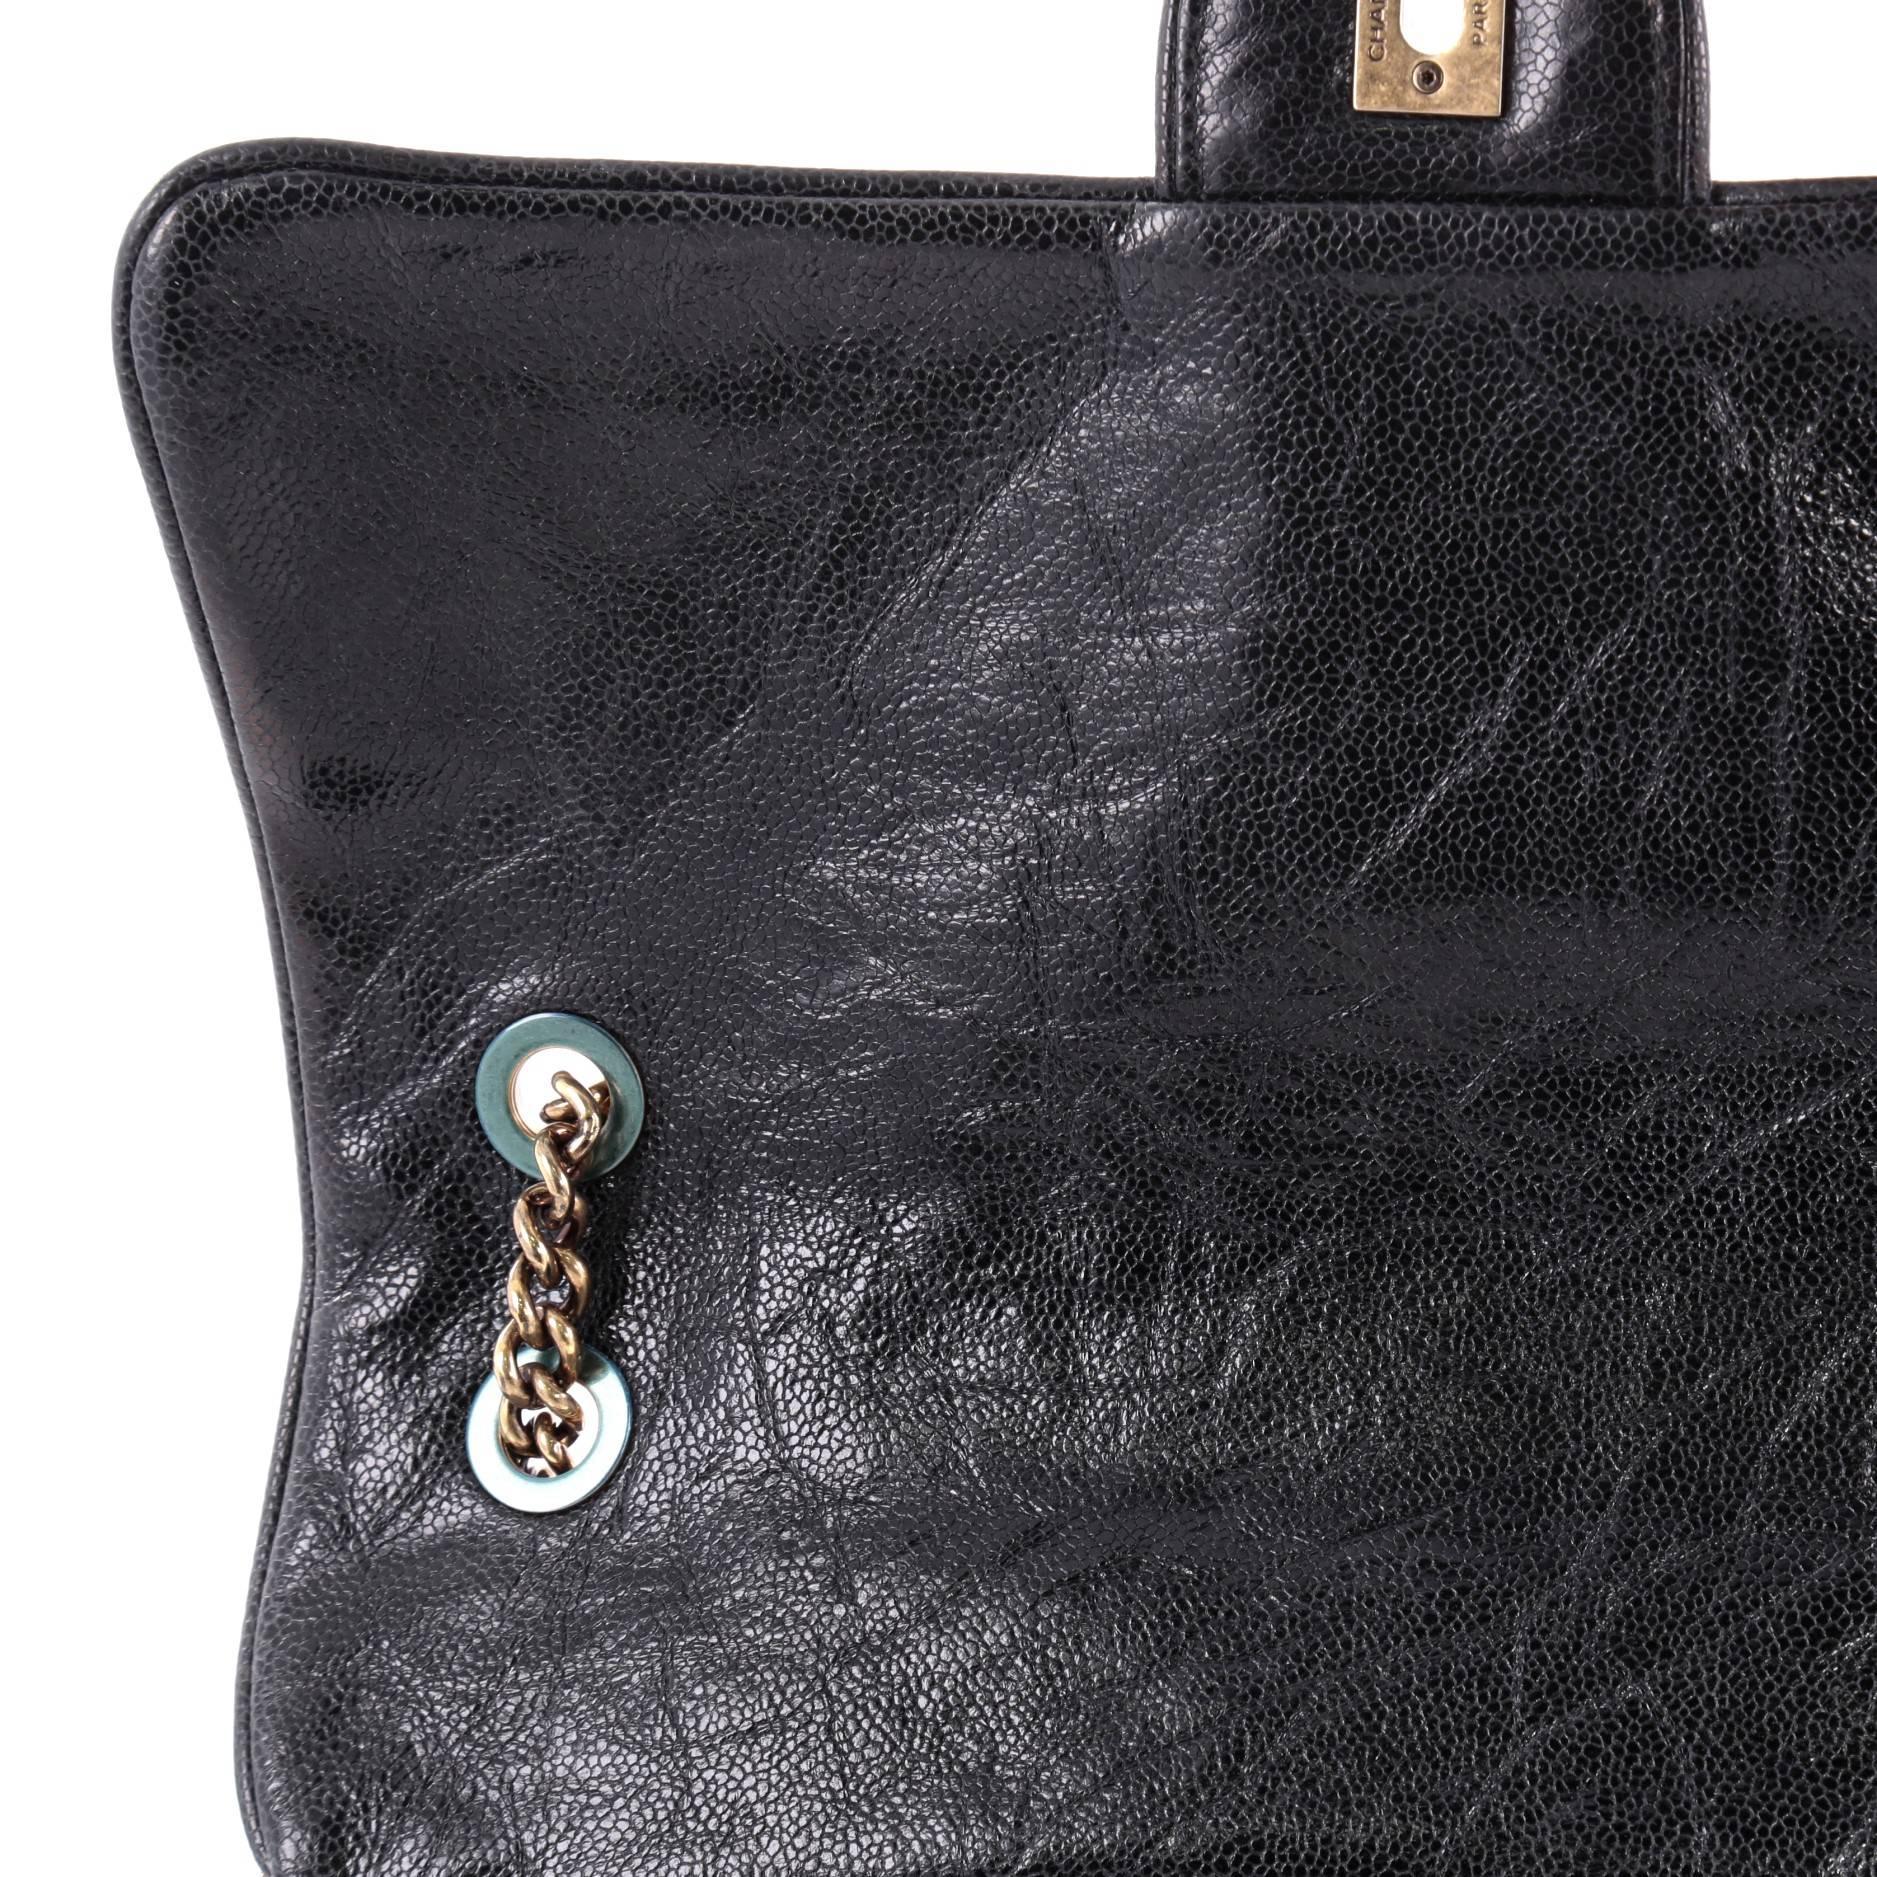 17b2b25ff14f Chanel Shiva Flap Bag Quilted Caviar Large at 1stdibs